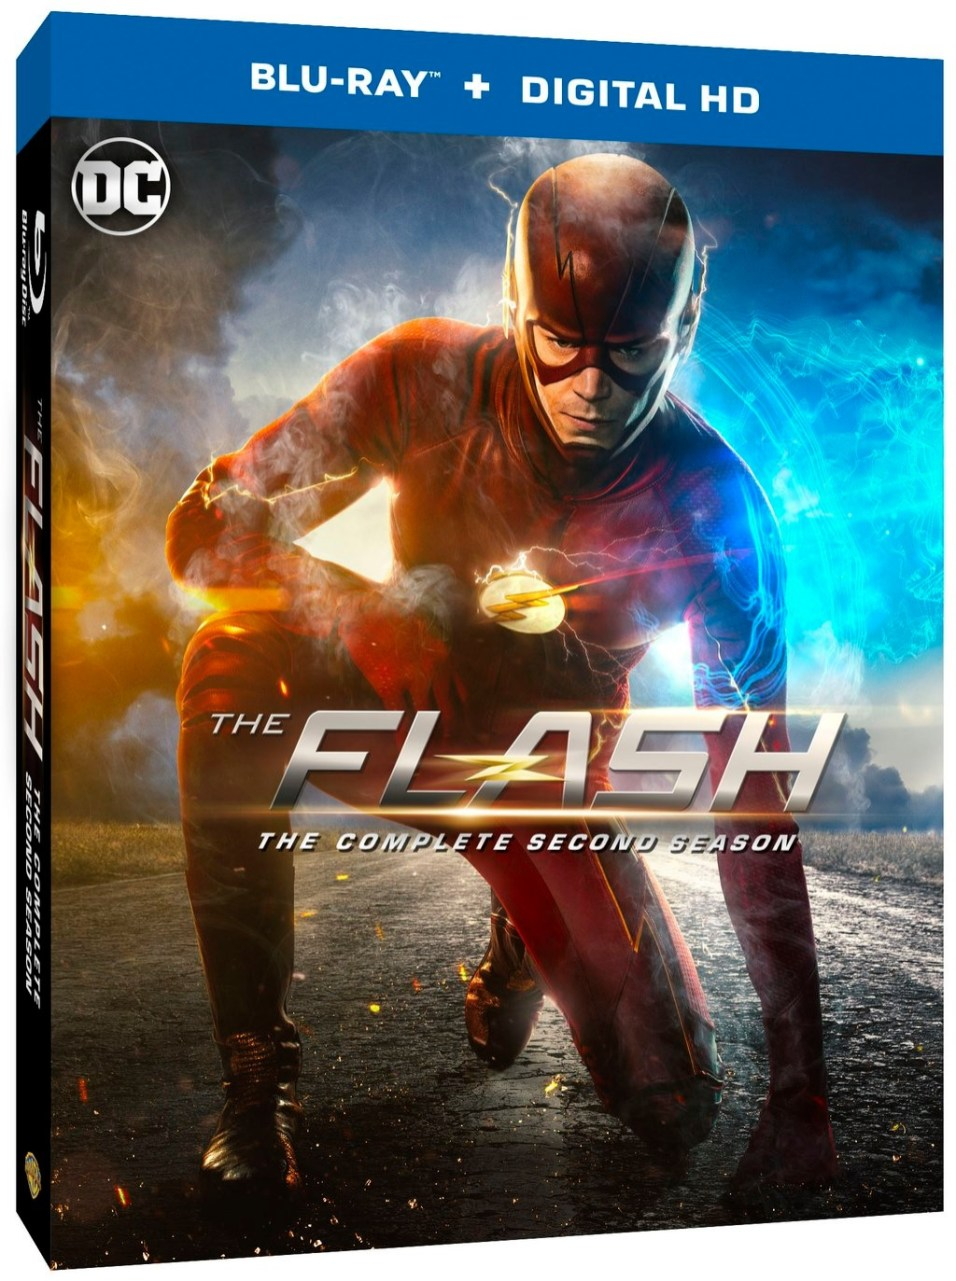 The Flash Season 2 Blu-Ray Edition